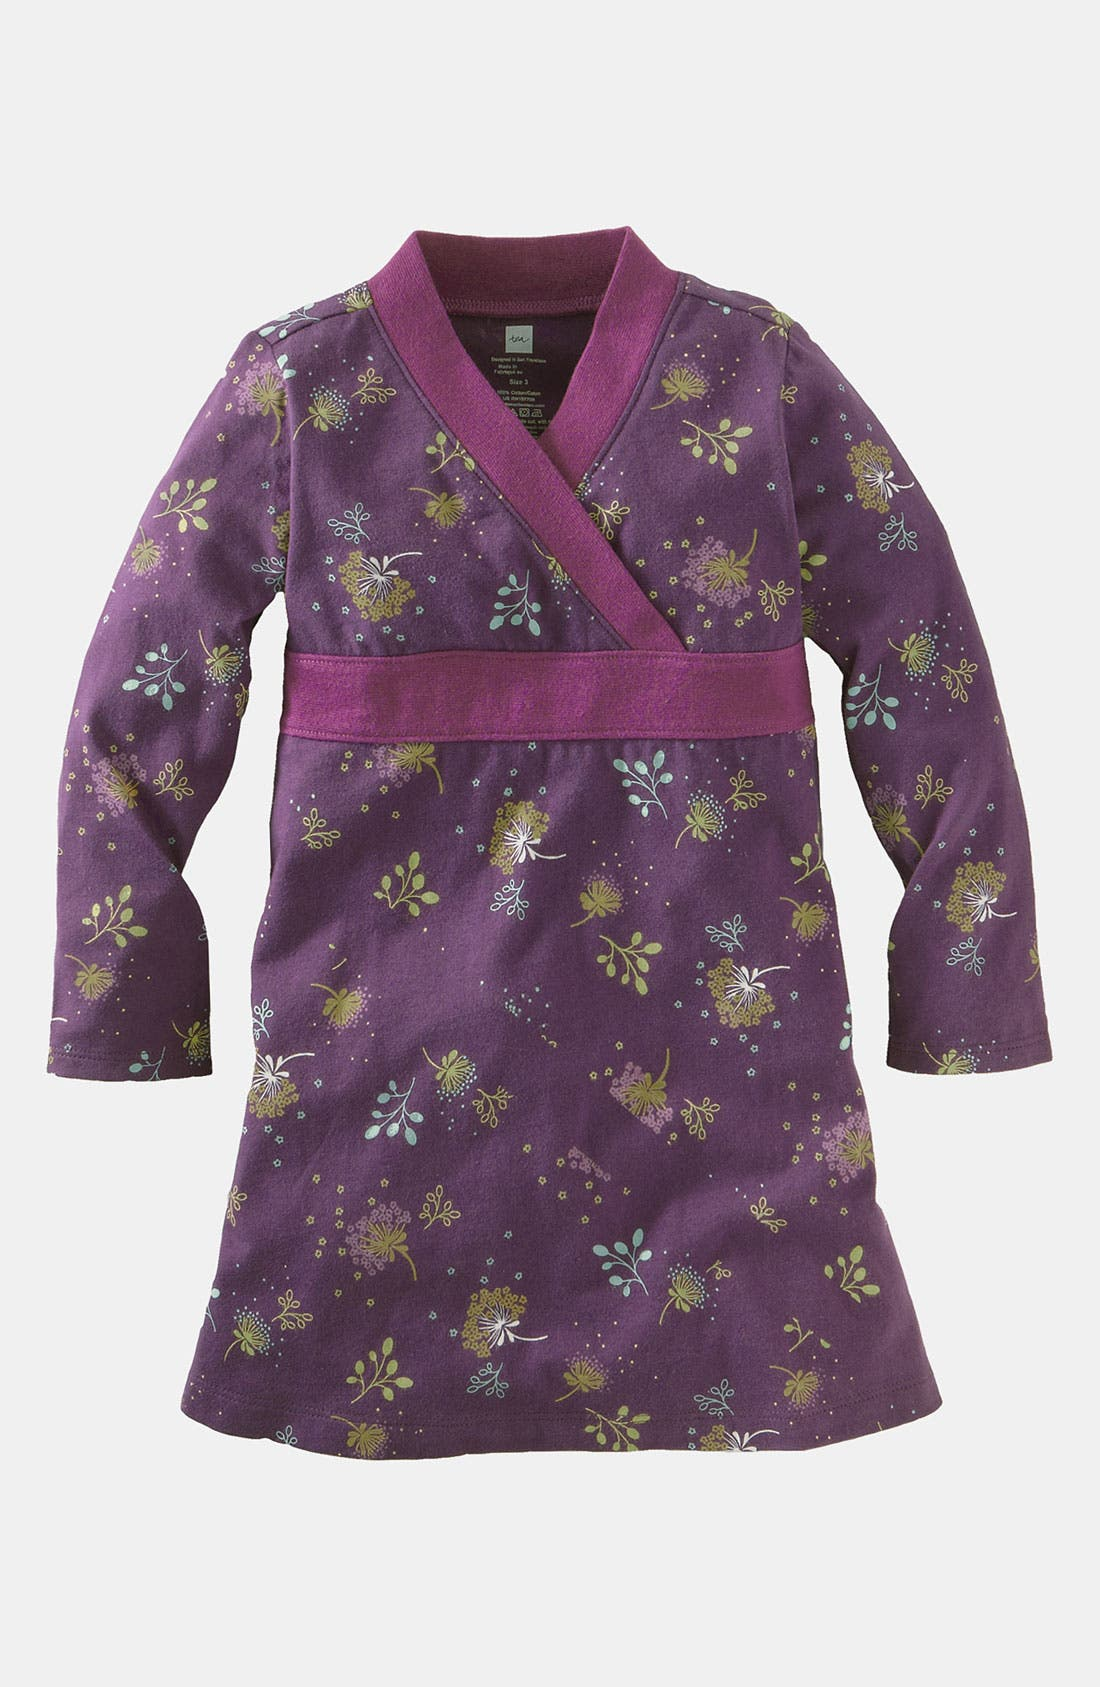 Alternate Image 1 Selected - Tea Collection 'Juniper' Dress (Little Girls & Big Girls)